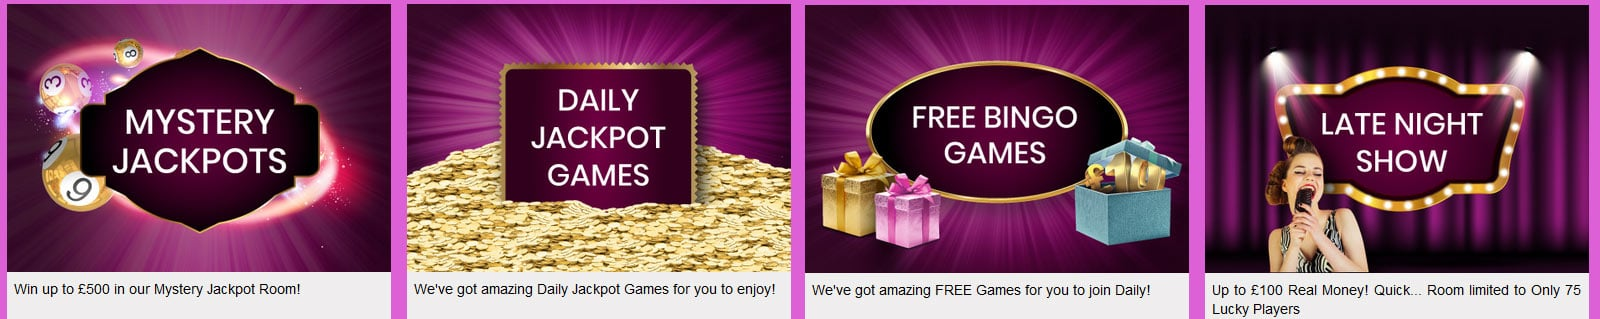 So Bingo Promotion Games